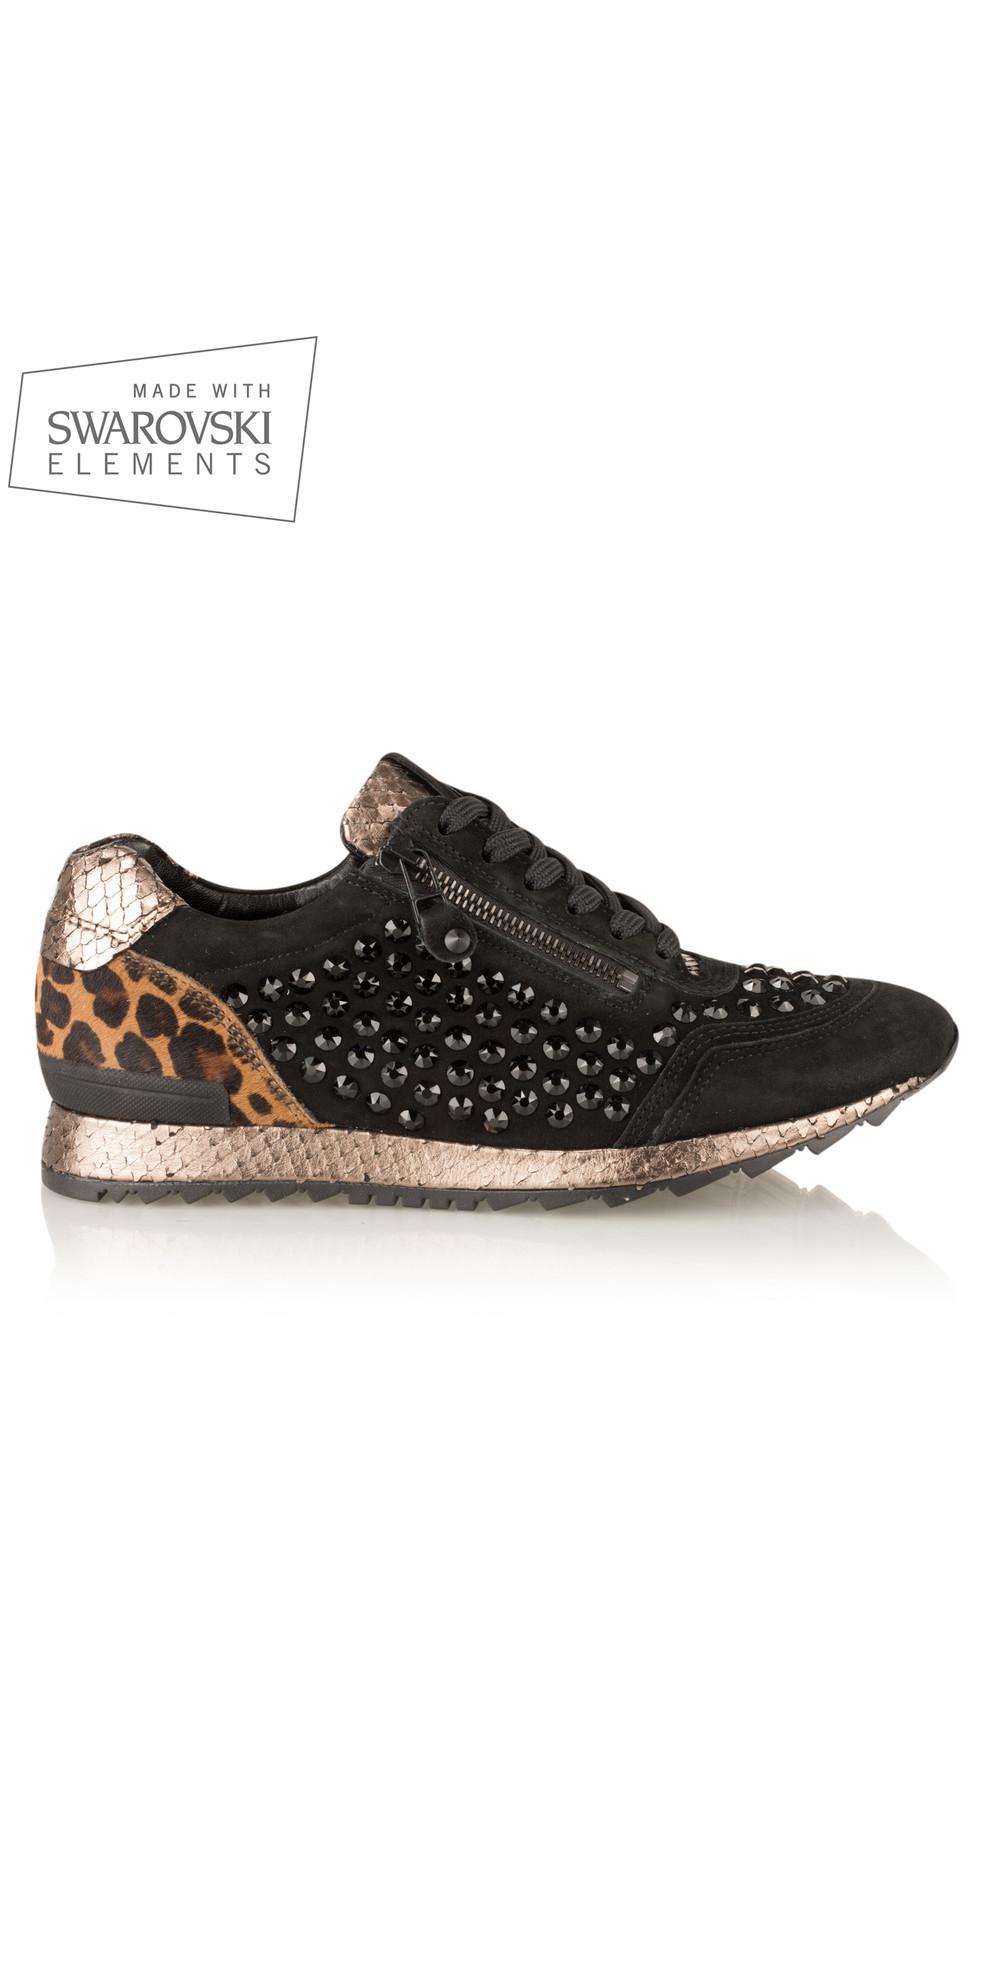 kennel und schmenger runner kombi trainer shoe with. Black Bedroom Furniture Sets. Home Design Ideas